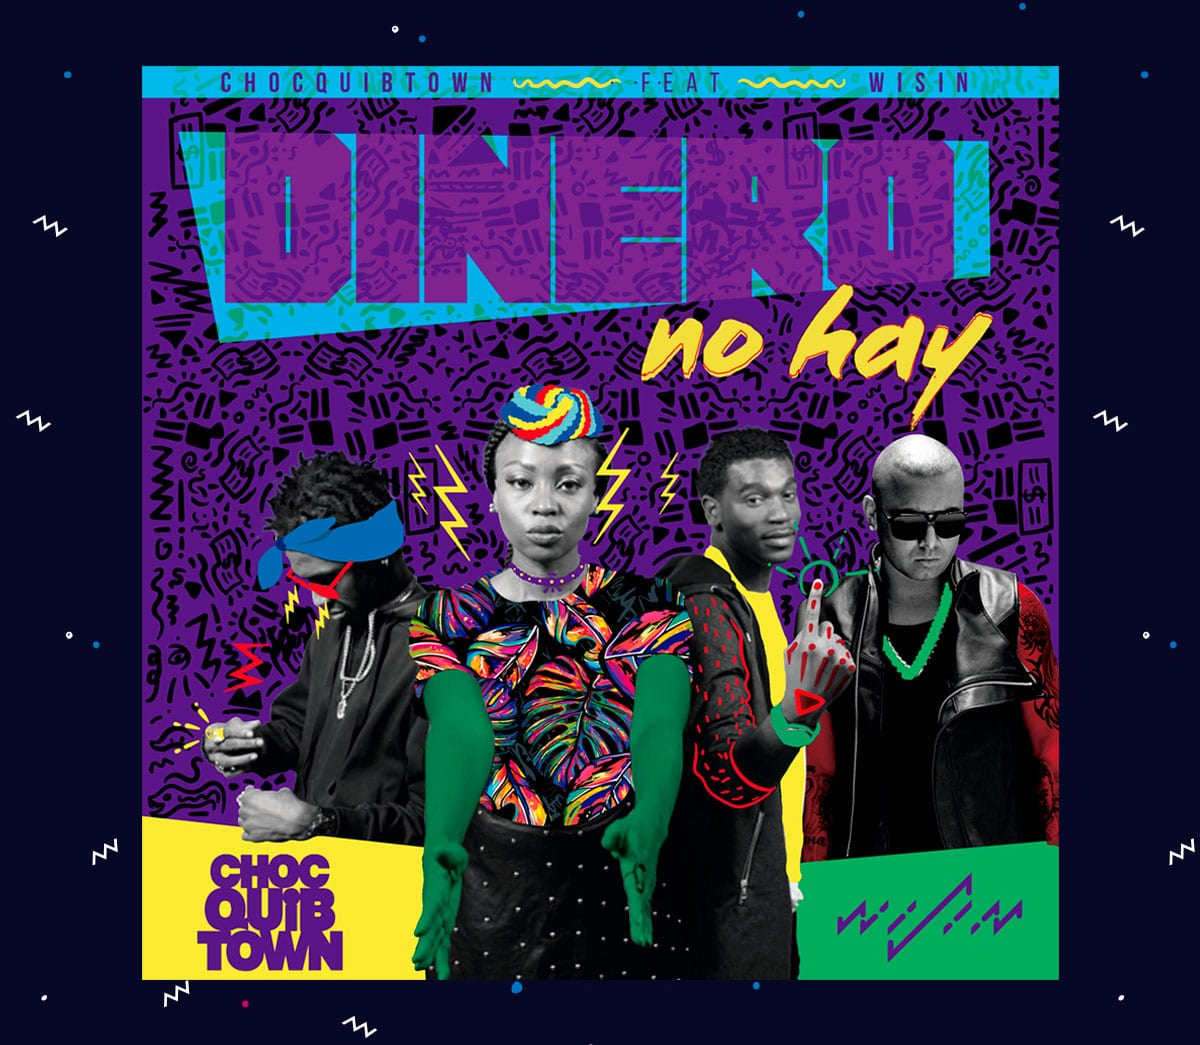 ChocQuibTown (Dinero no Hay) CD Cover